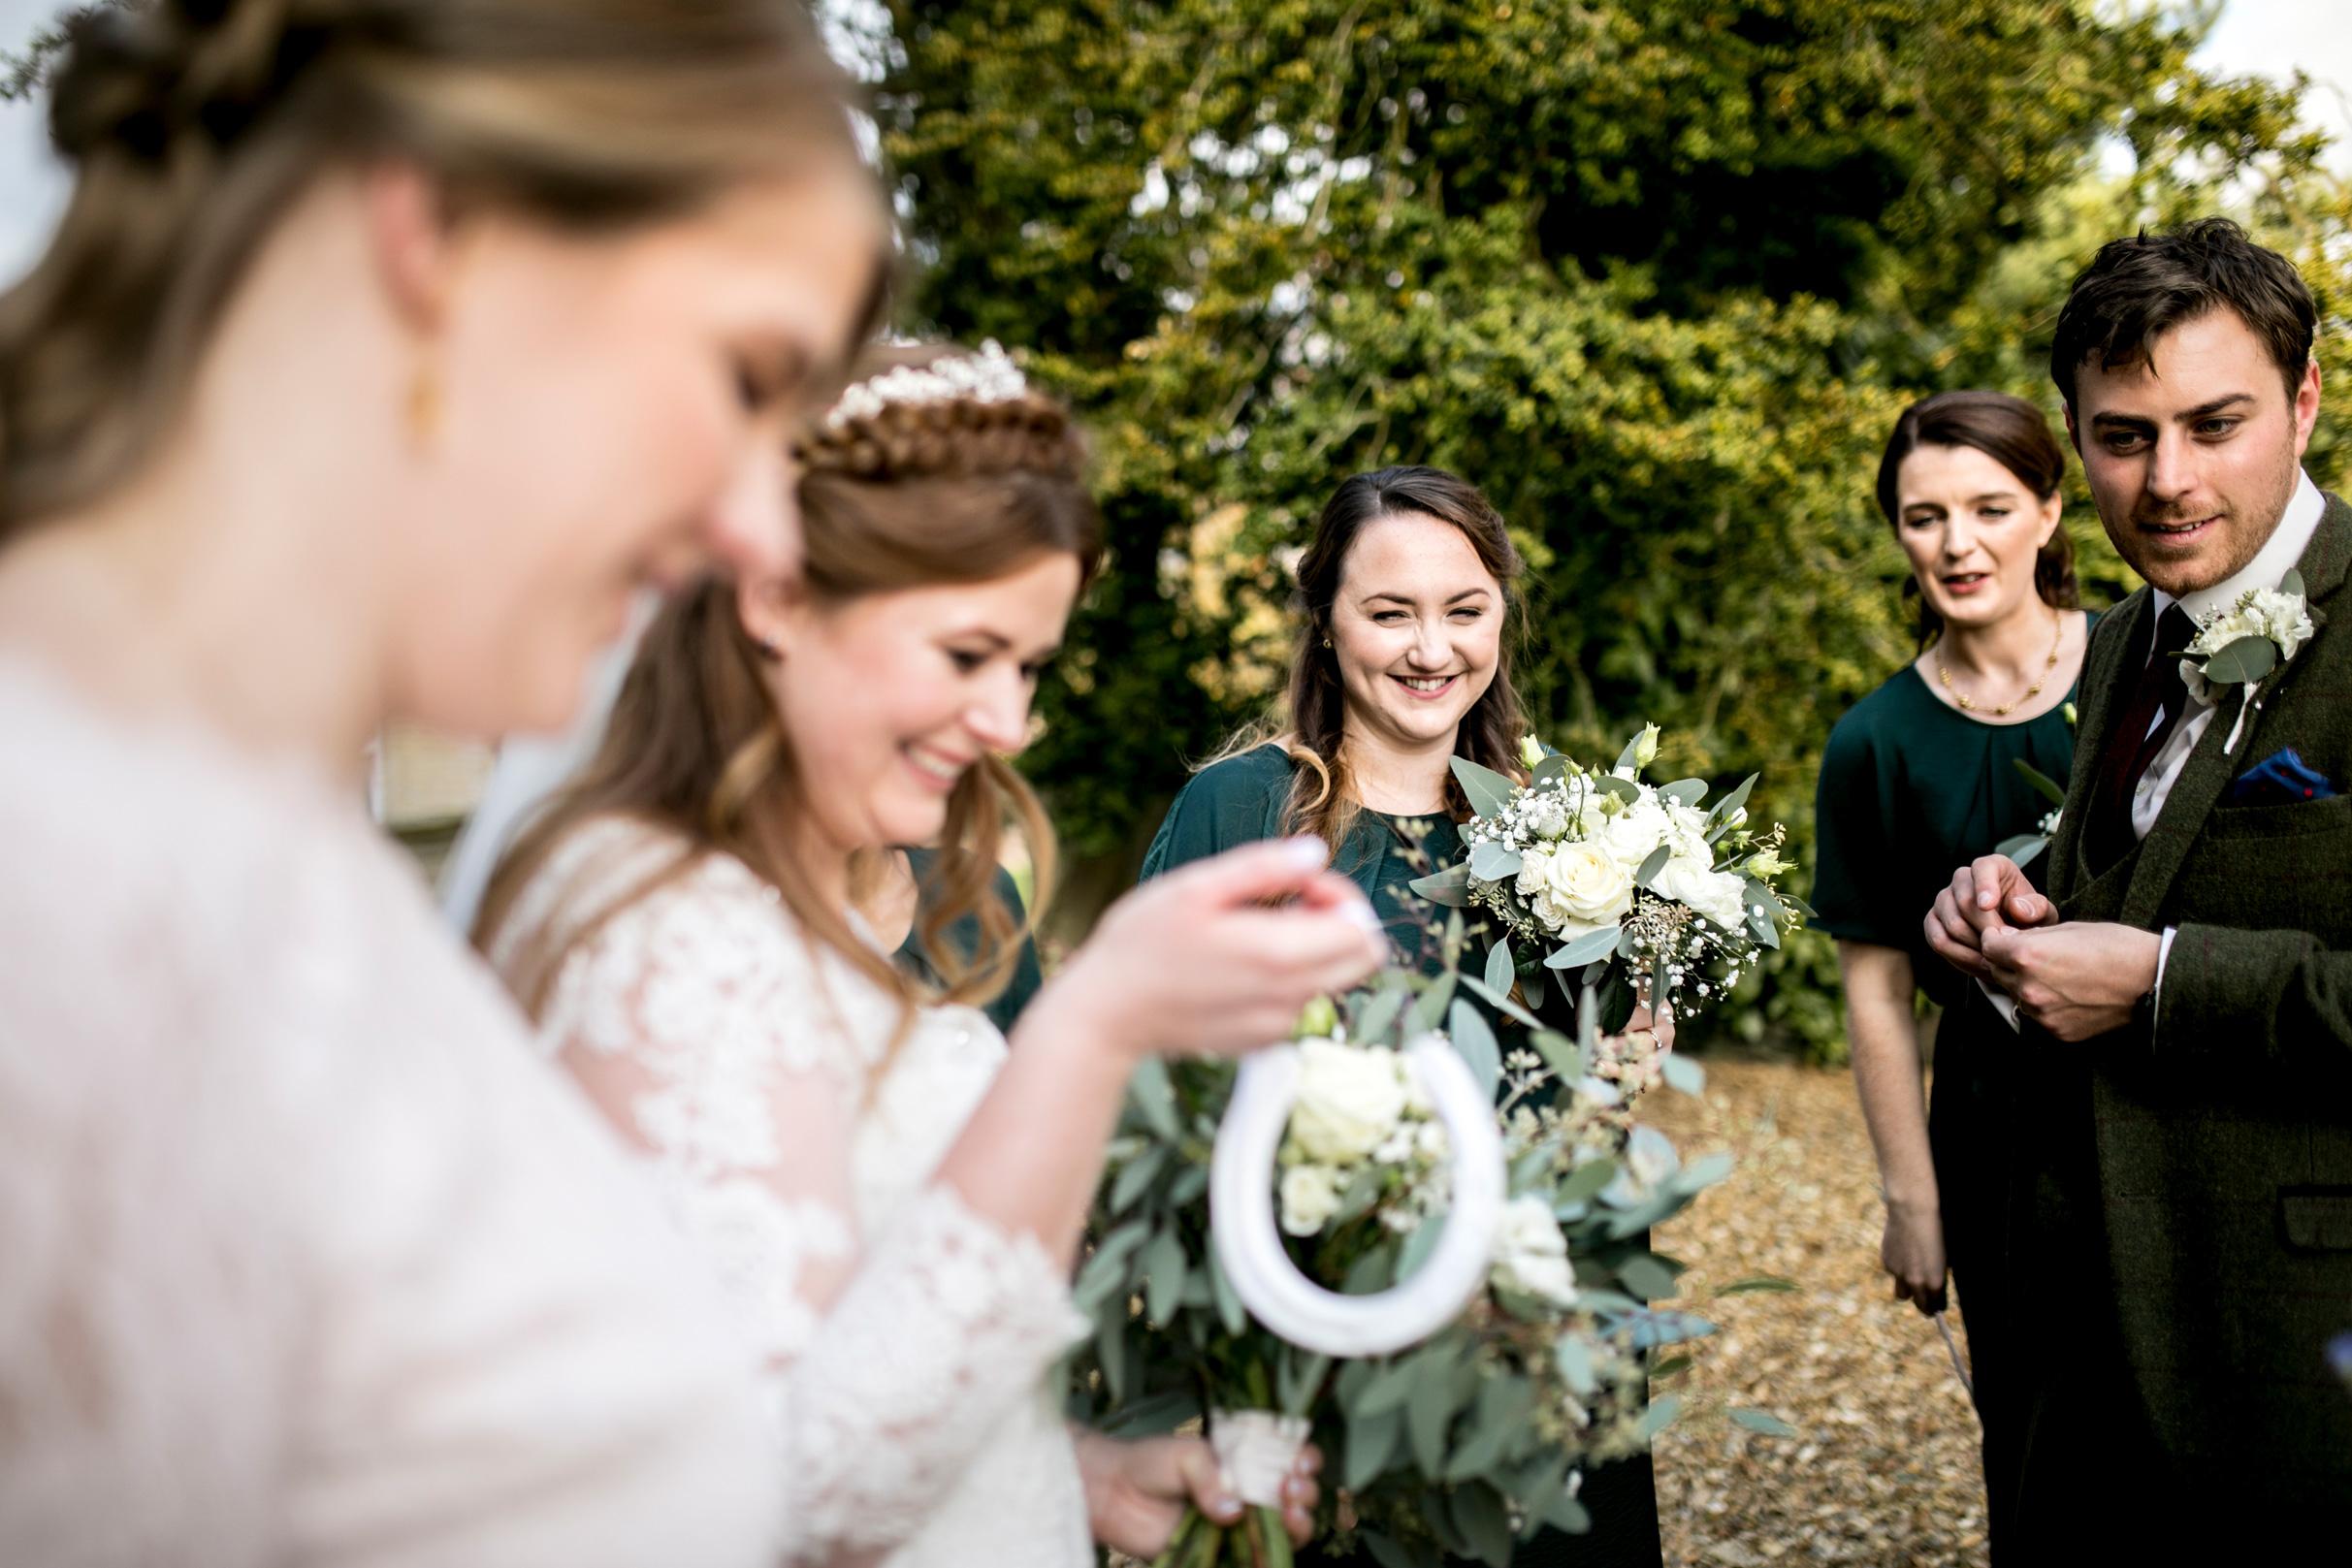 Bridesmaids, Bridal Party, Wedding Flowers, Natural Wedding,